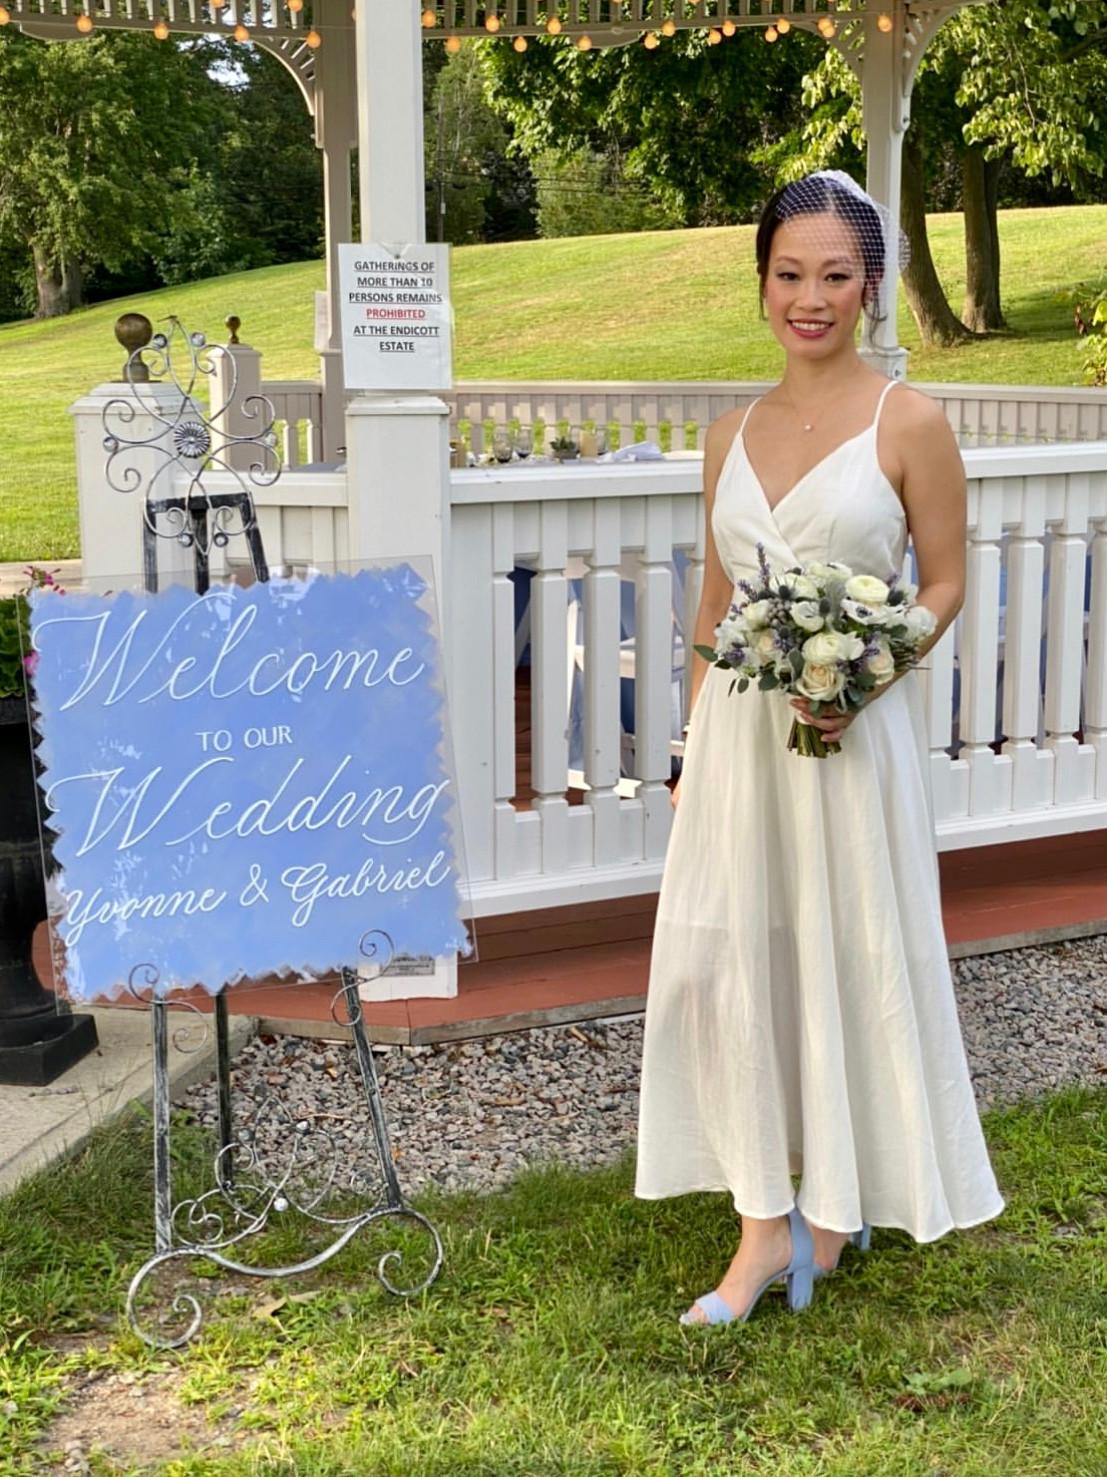 Bridal Wedding Sign (Alex Gordias Photog